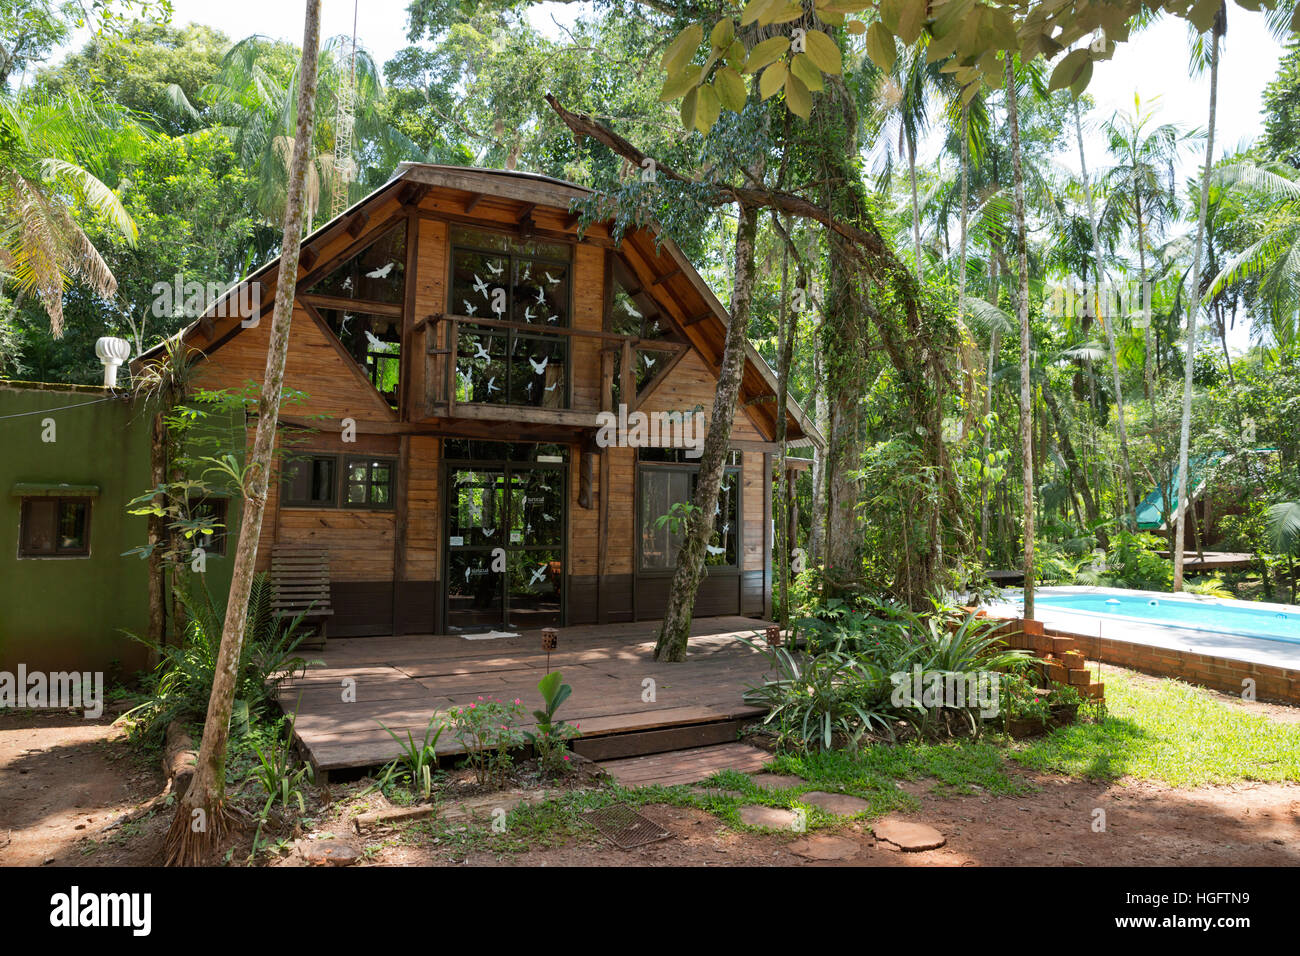 Surucua Reserva und Ecolodge in den Regenwald, Bert, Provinz Misiones, Argentinien, Südamerika Stockbild